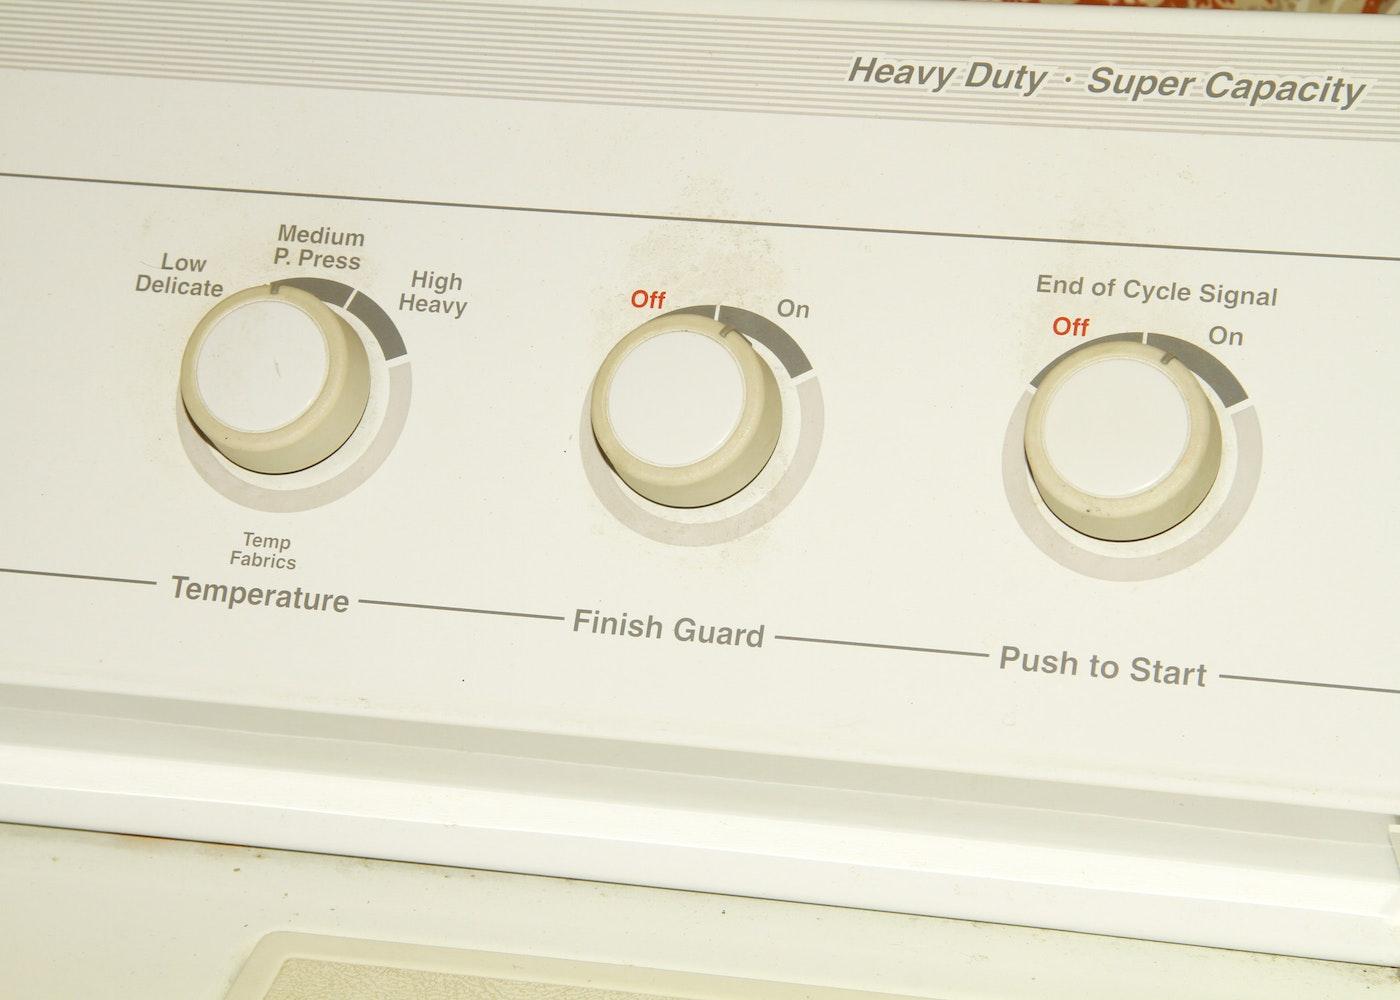 Estate Heavy Duty Super Capacity Top Load Washing Machine